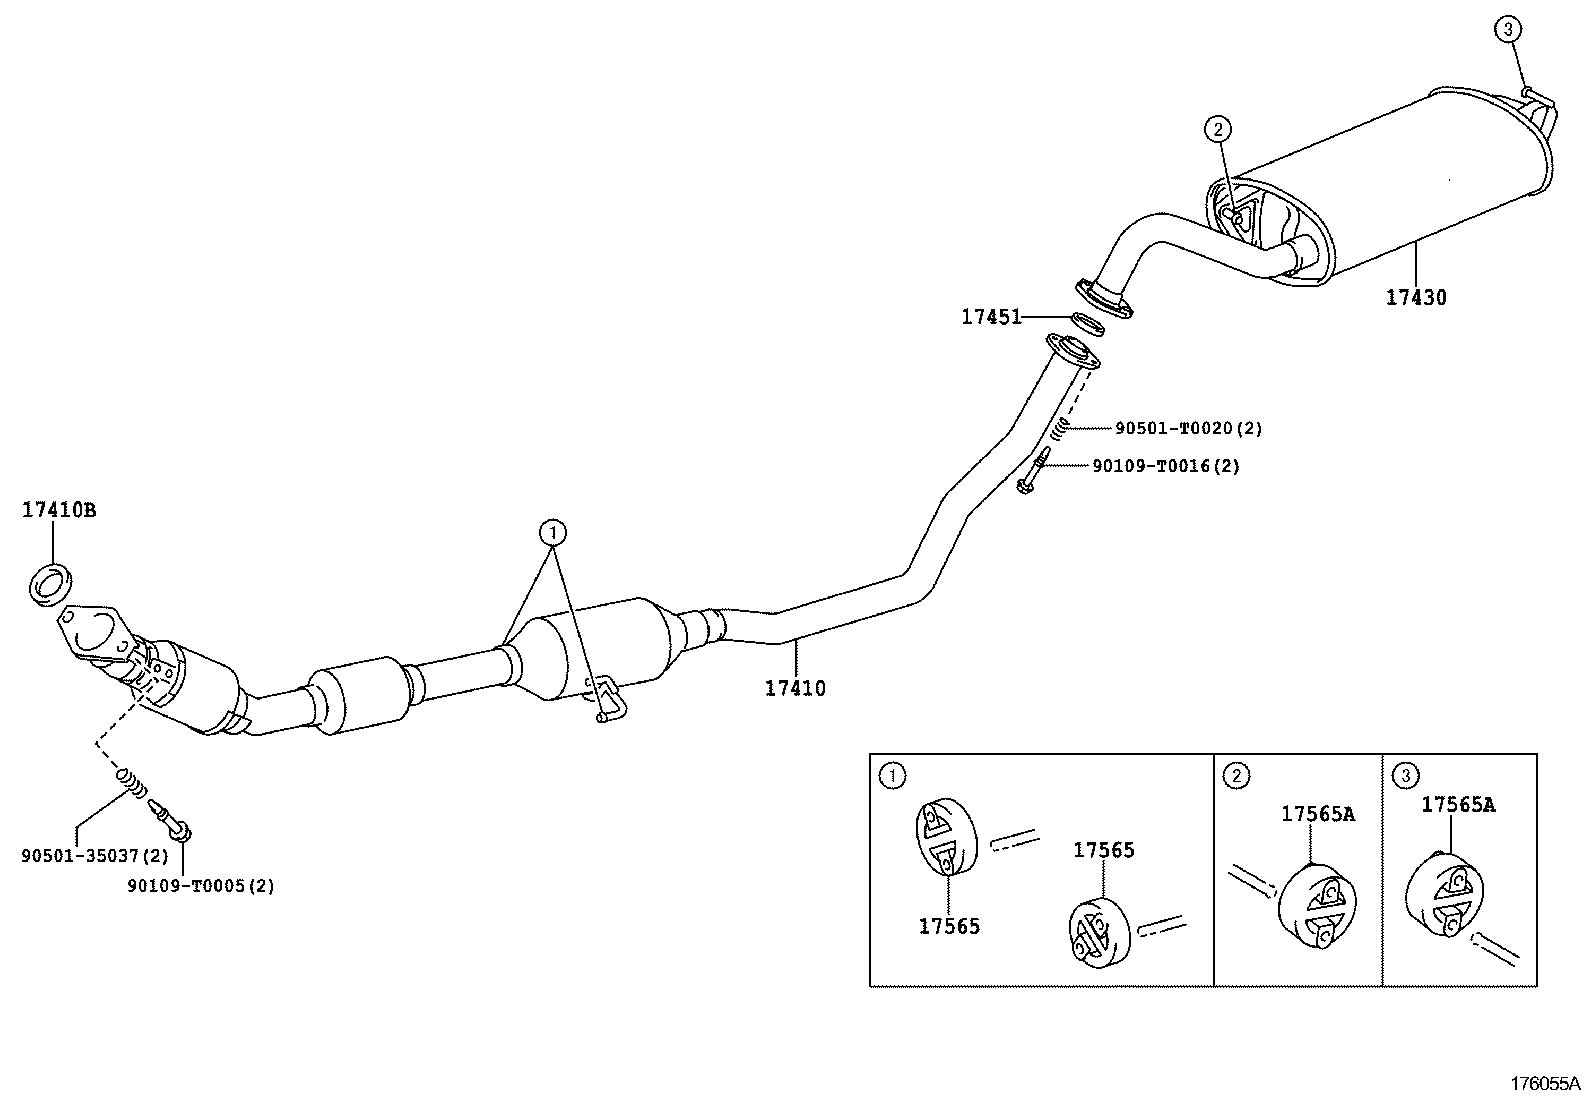 2001 toyota corolla exhaust system